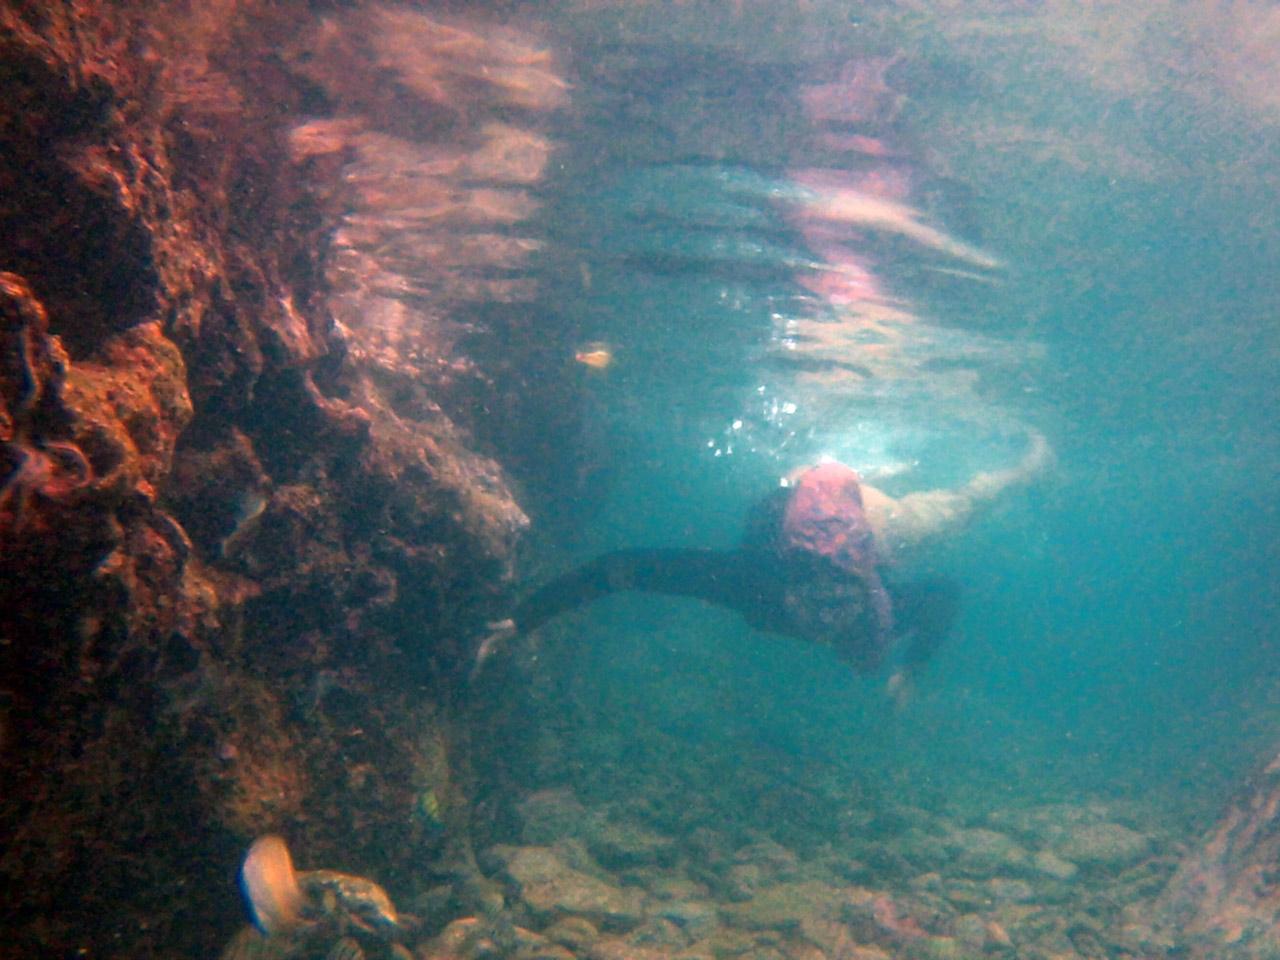 Teluk Kiluan - Tempat Wisata di Lampung - Yopie Pangkey - 6